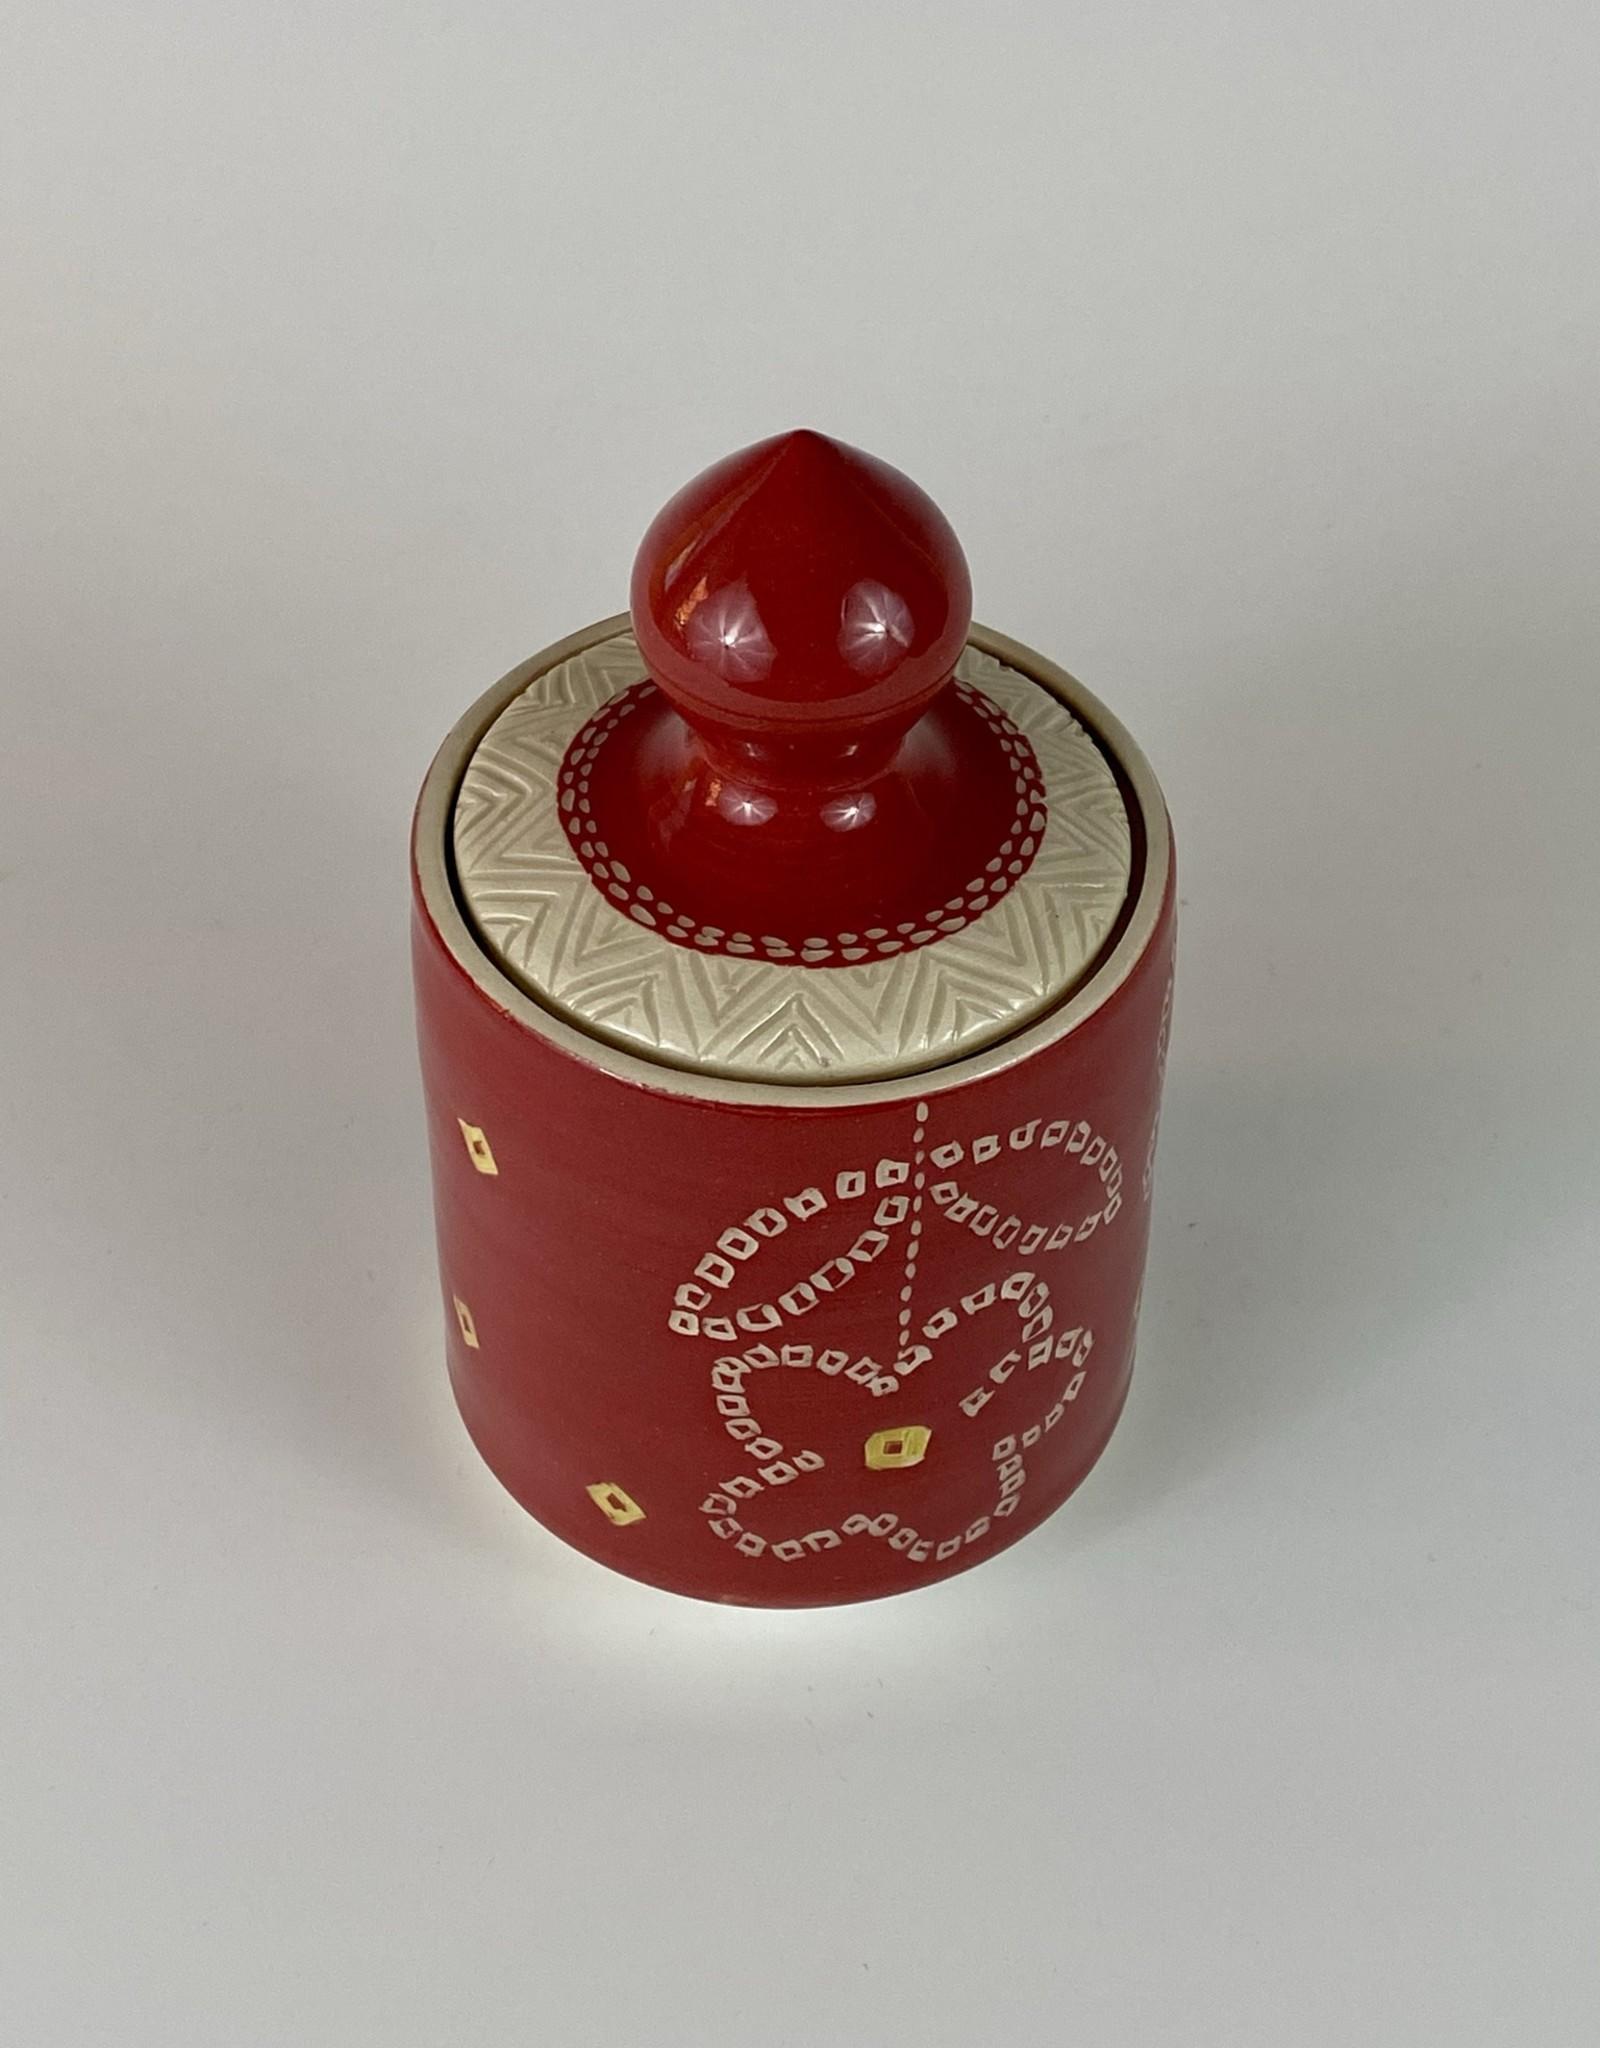 Anshula Tayal Amaati Lidded jar Red Bandhani